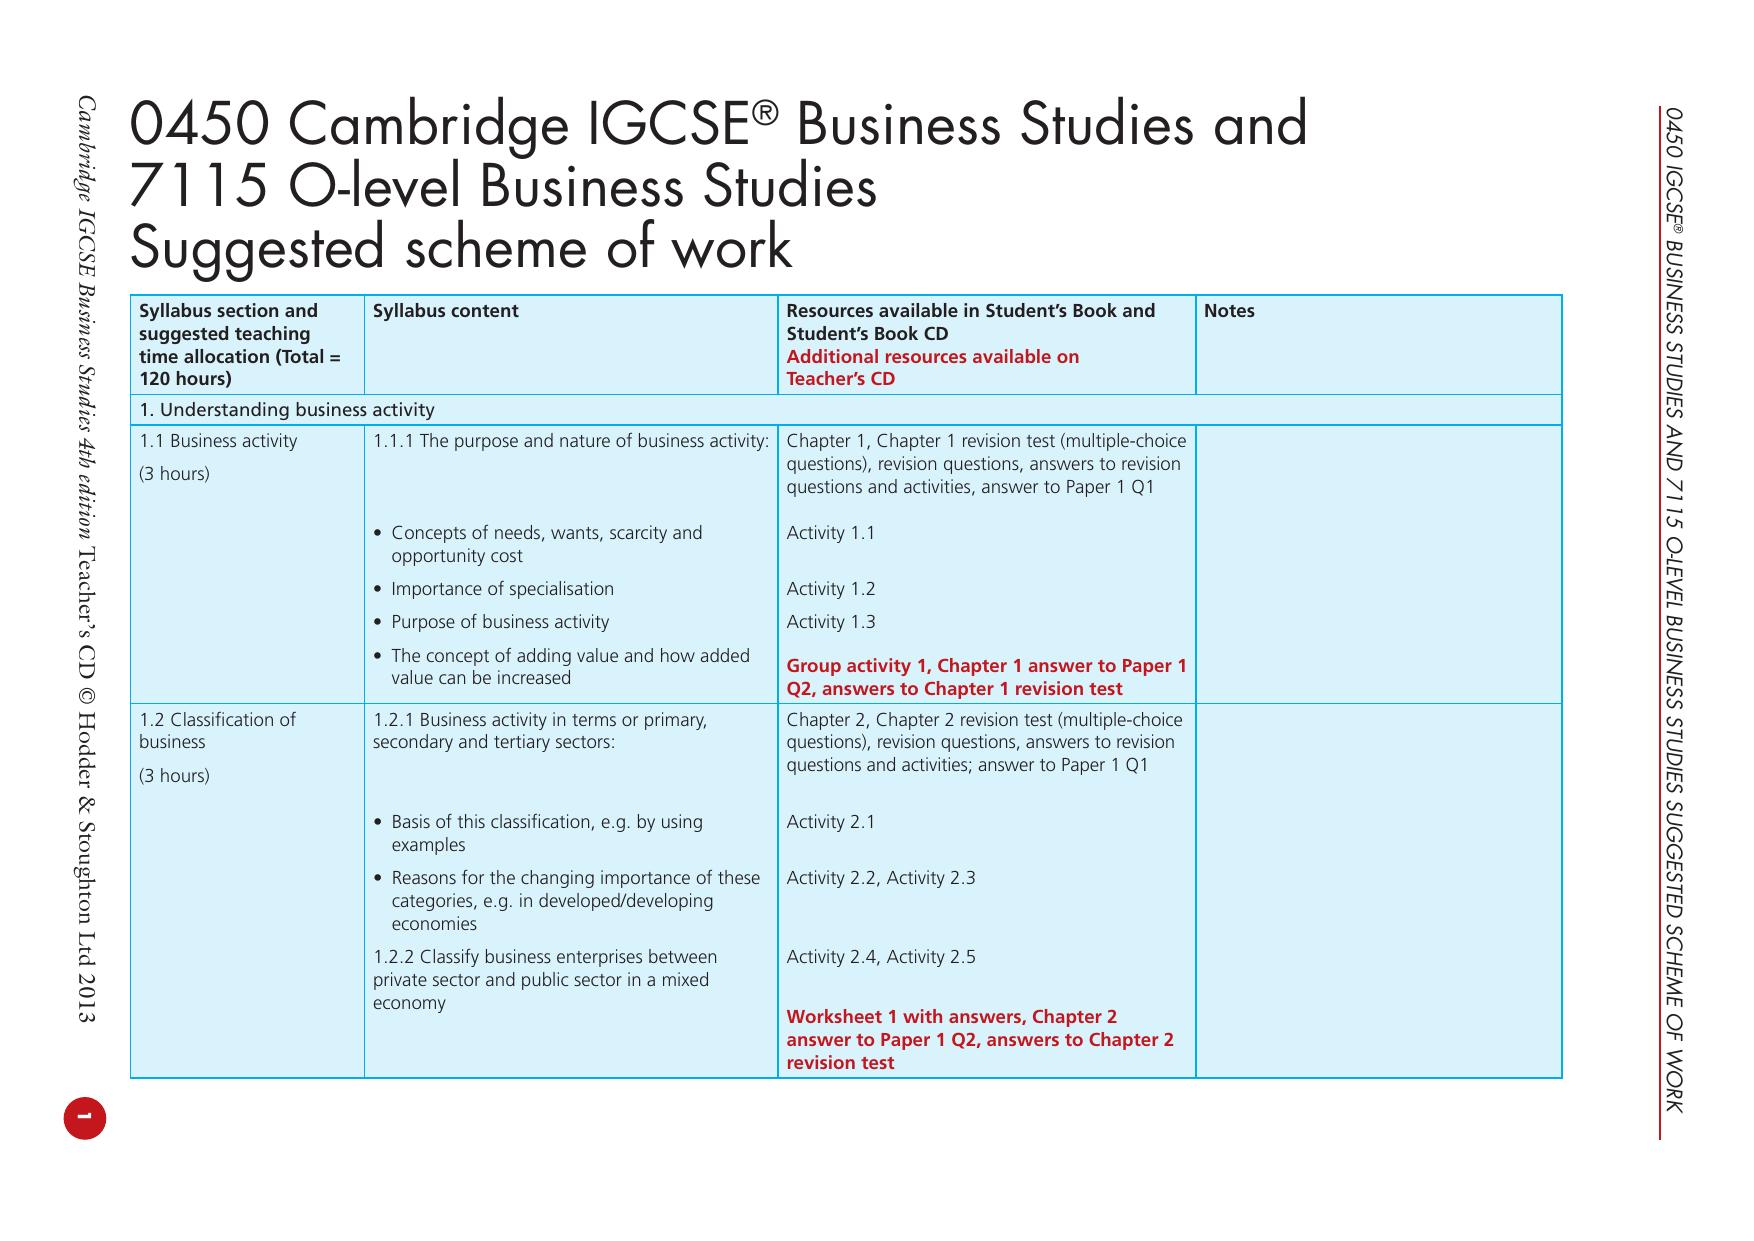 Cambridge igcse business studies 0450 and 7115 olevel suggested.